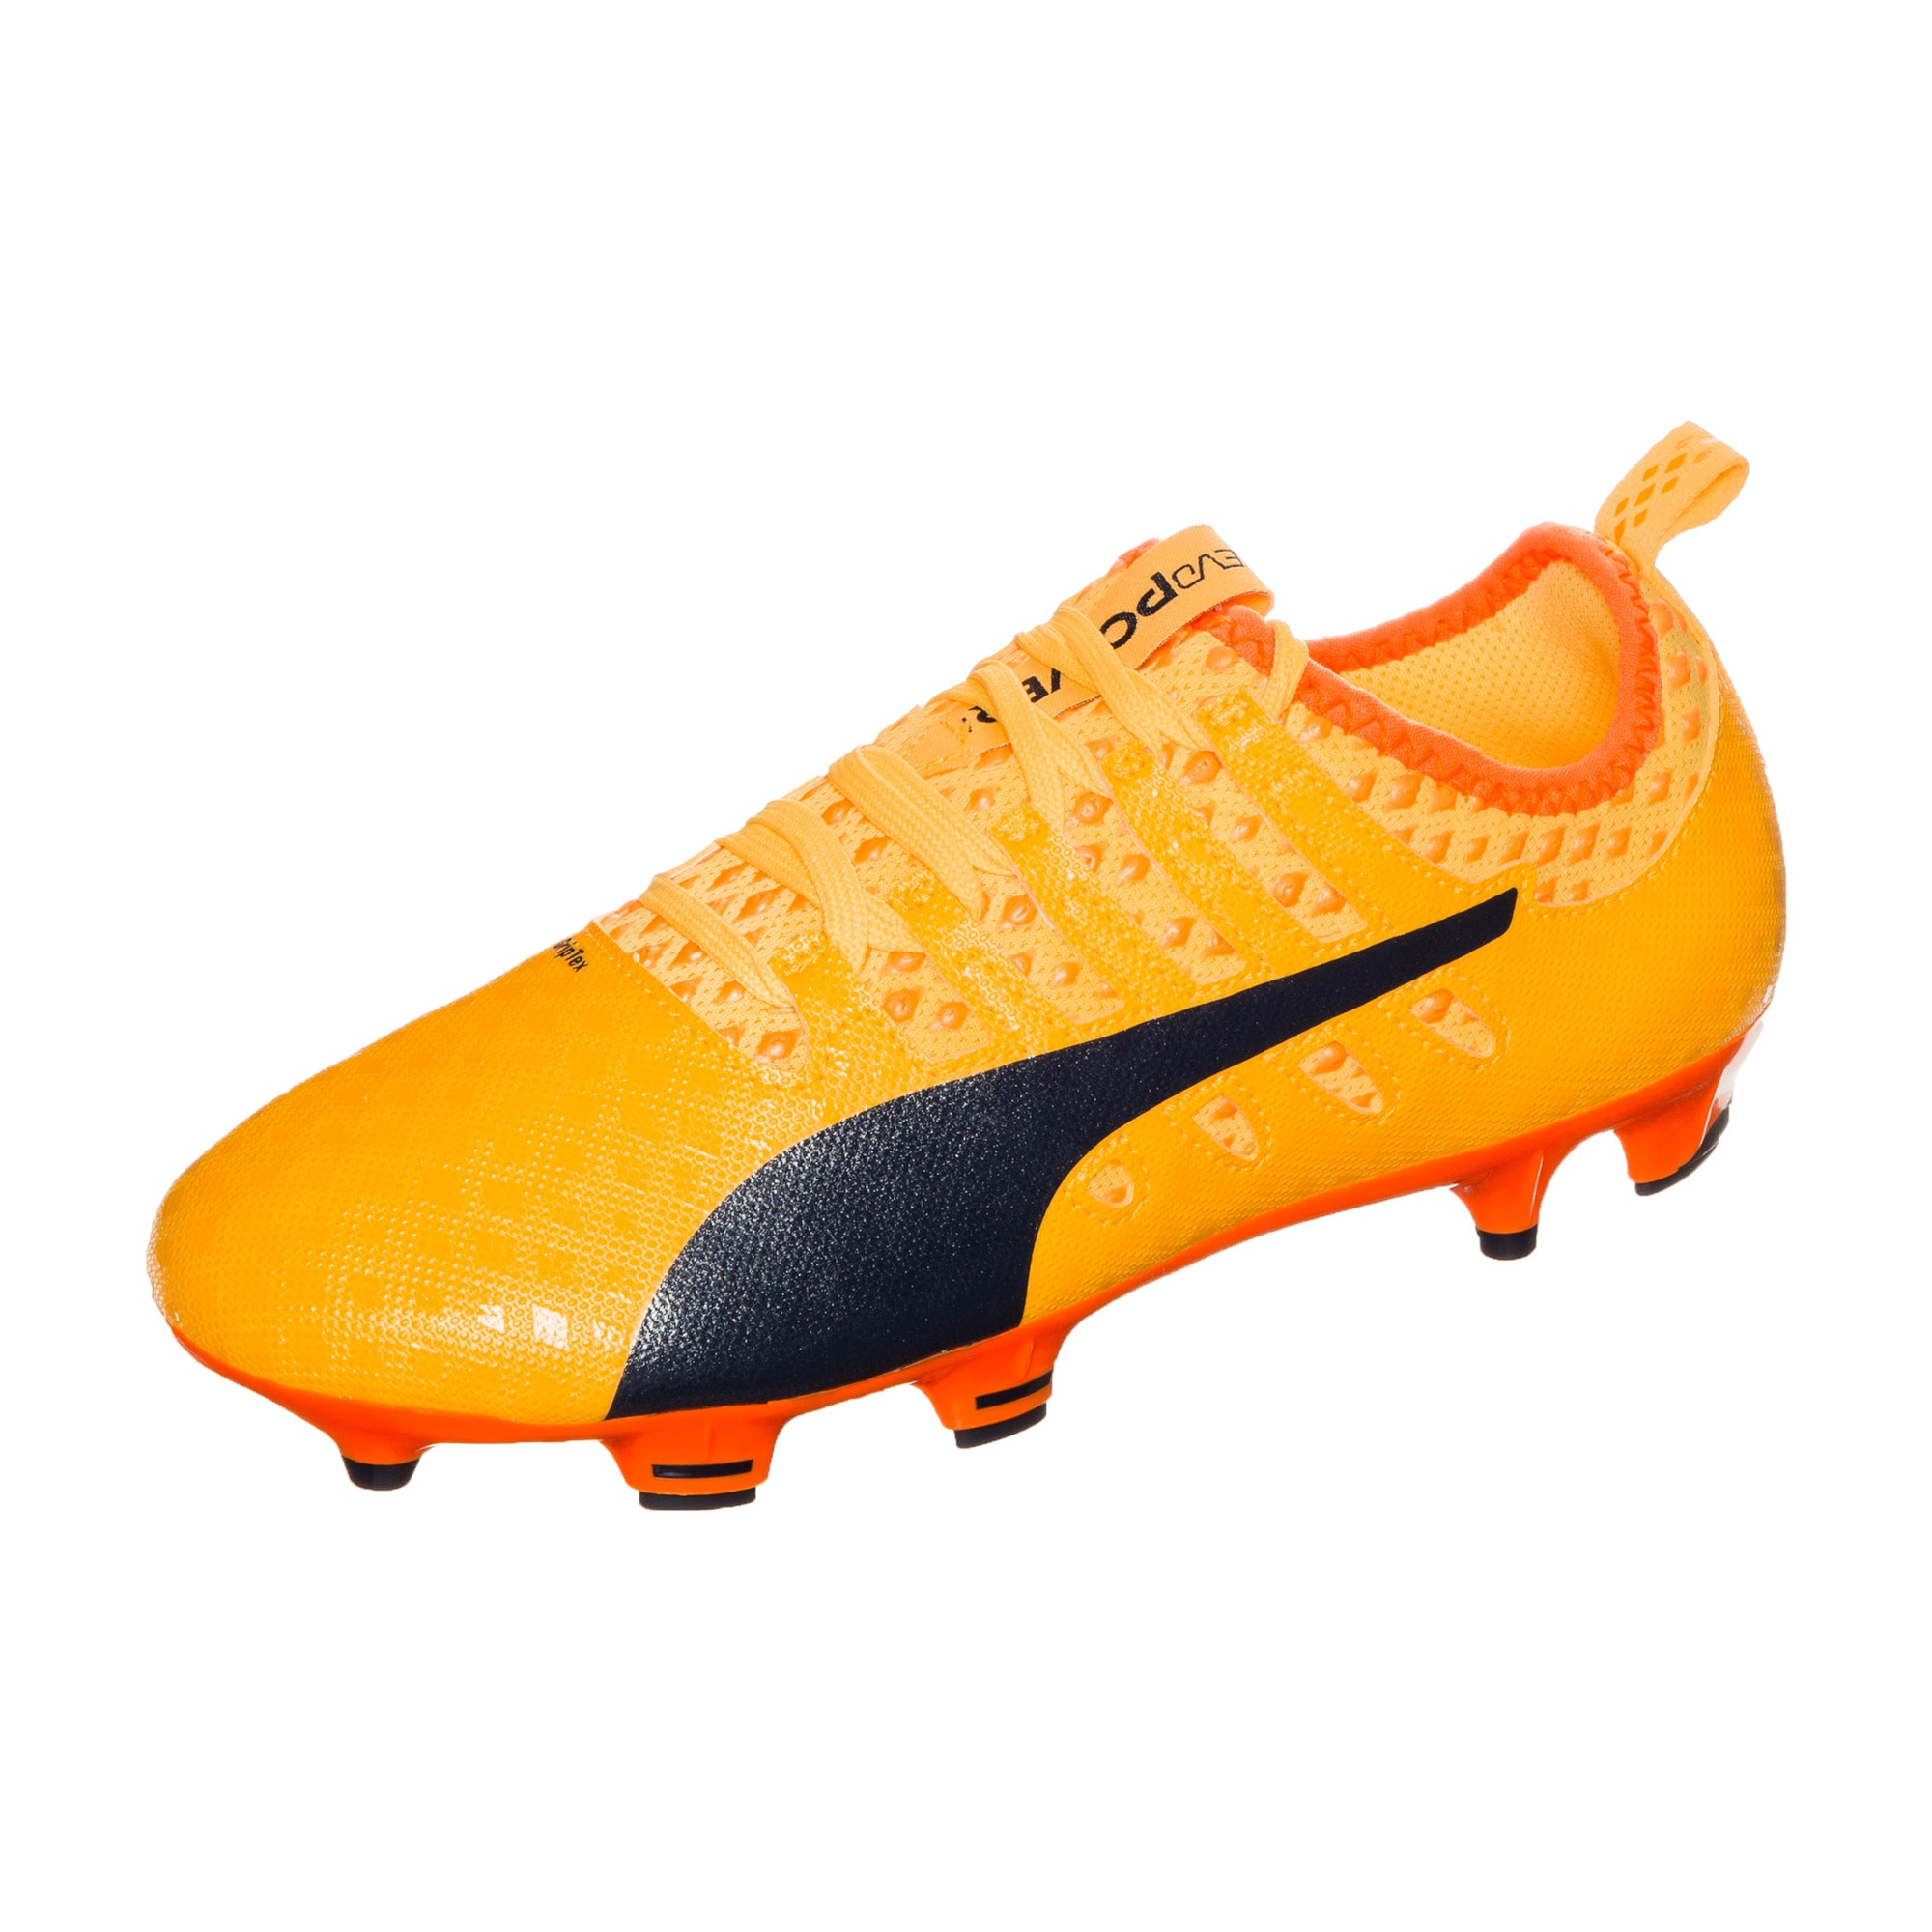 ´evoPOWER Vigor 1 FG´ Fußballschuh